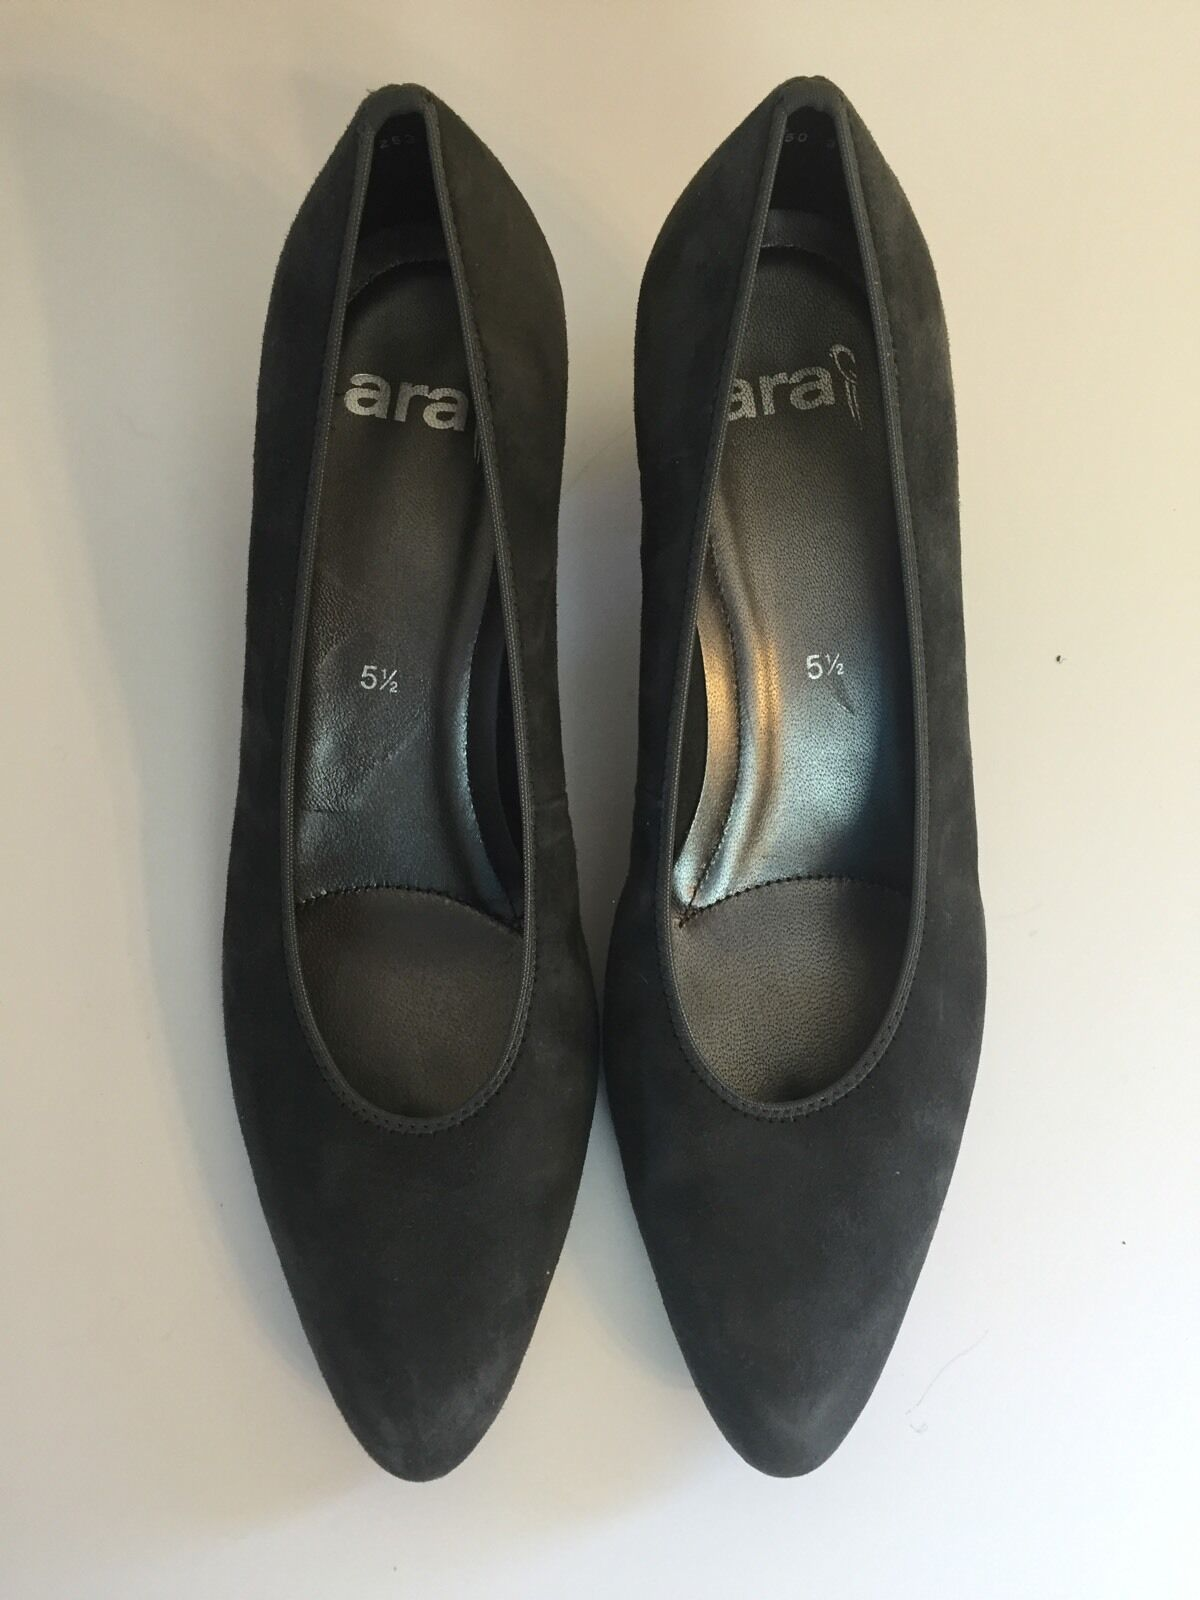 ARA Knokk damen US 8 grau Heels UK 5.5